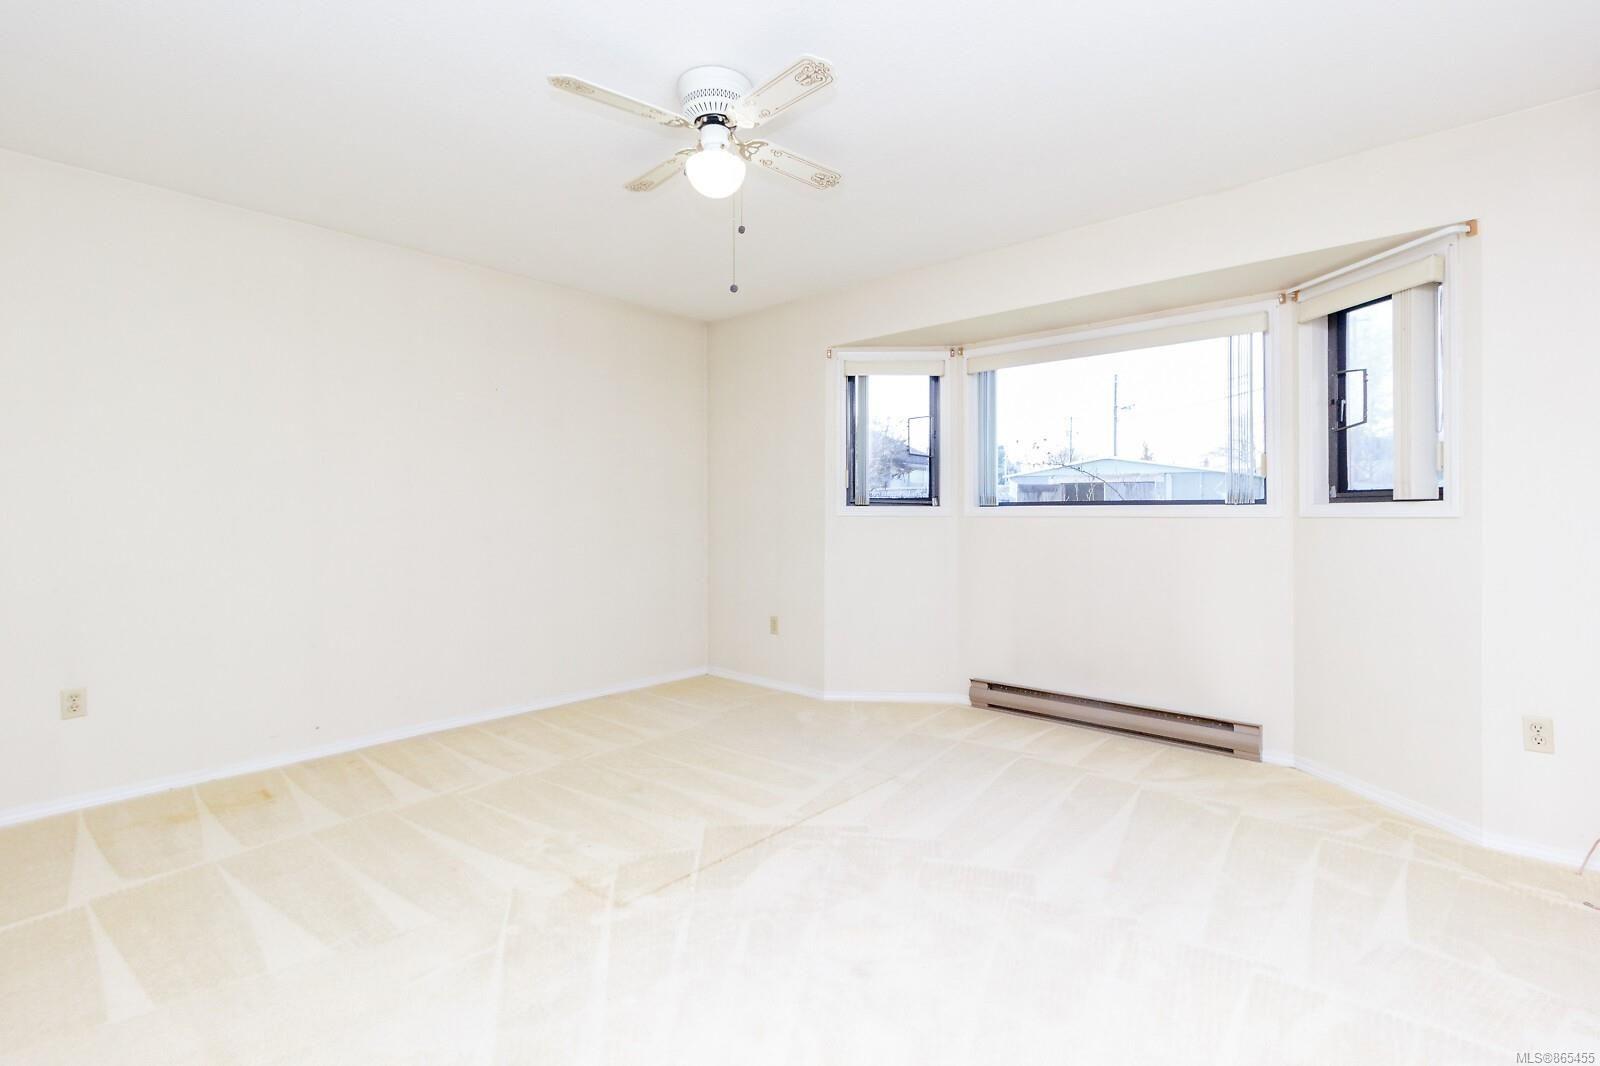 Photo 15: Photos: 399 Beech Ave in : Du East Duncan House for sale (Duncan)  : MLS®# 865455